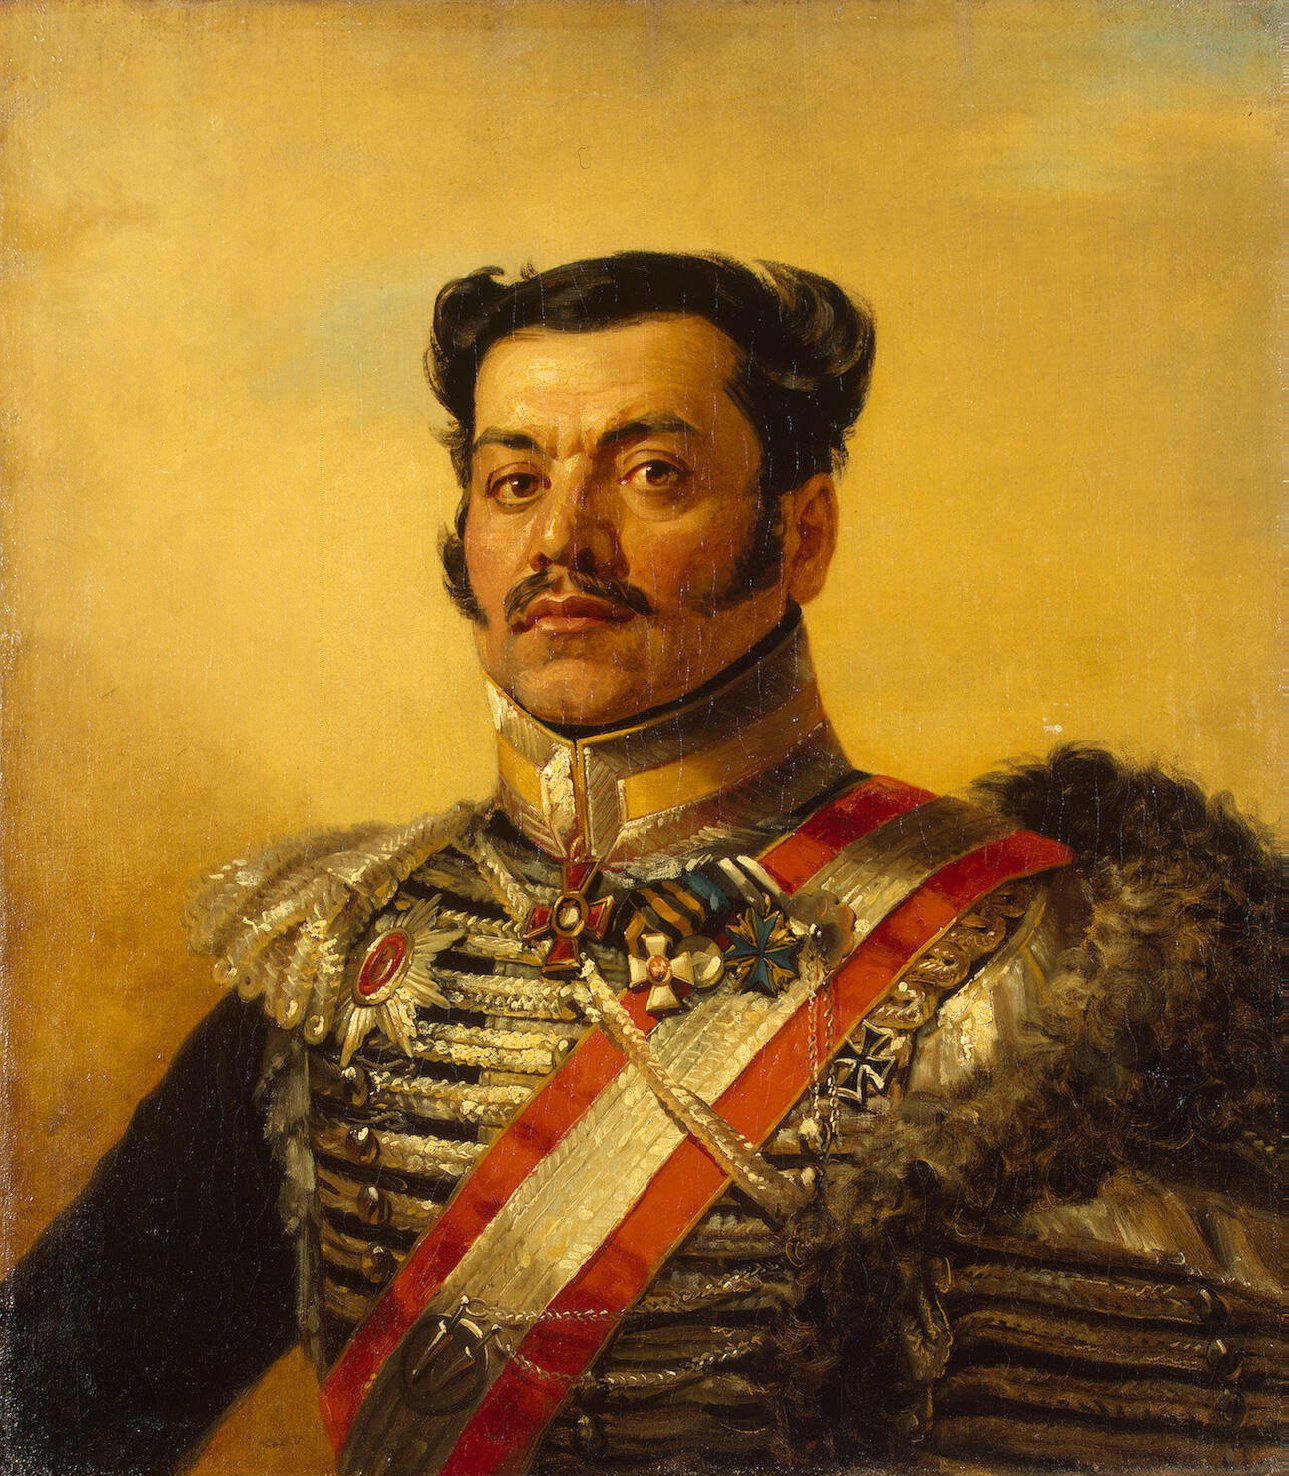 Трощинский, Иван Ефимович